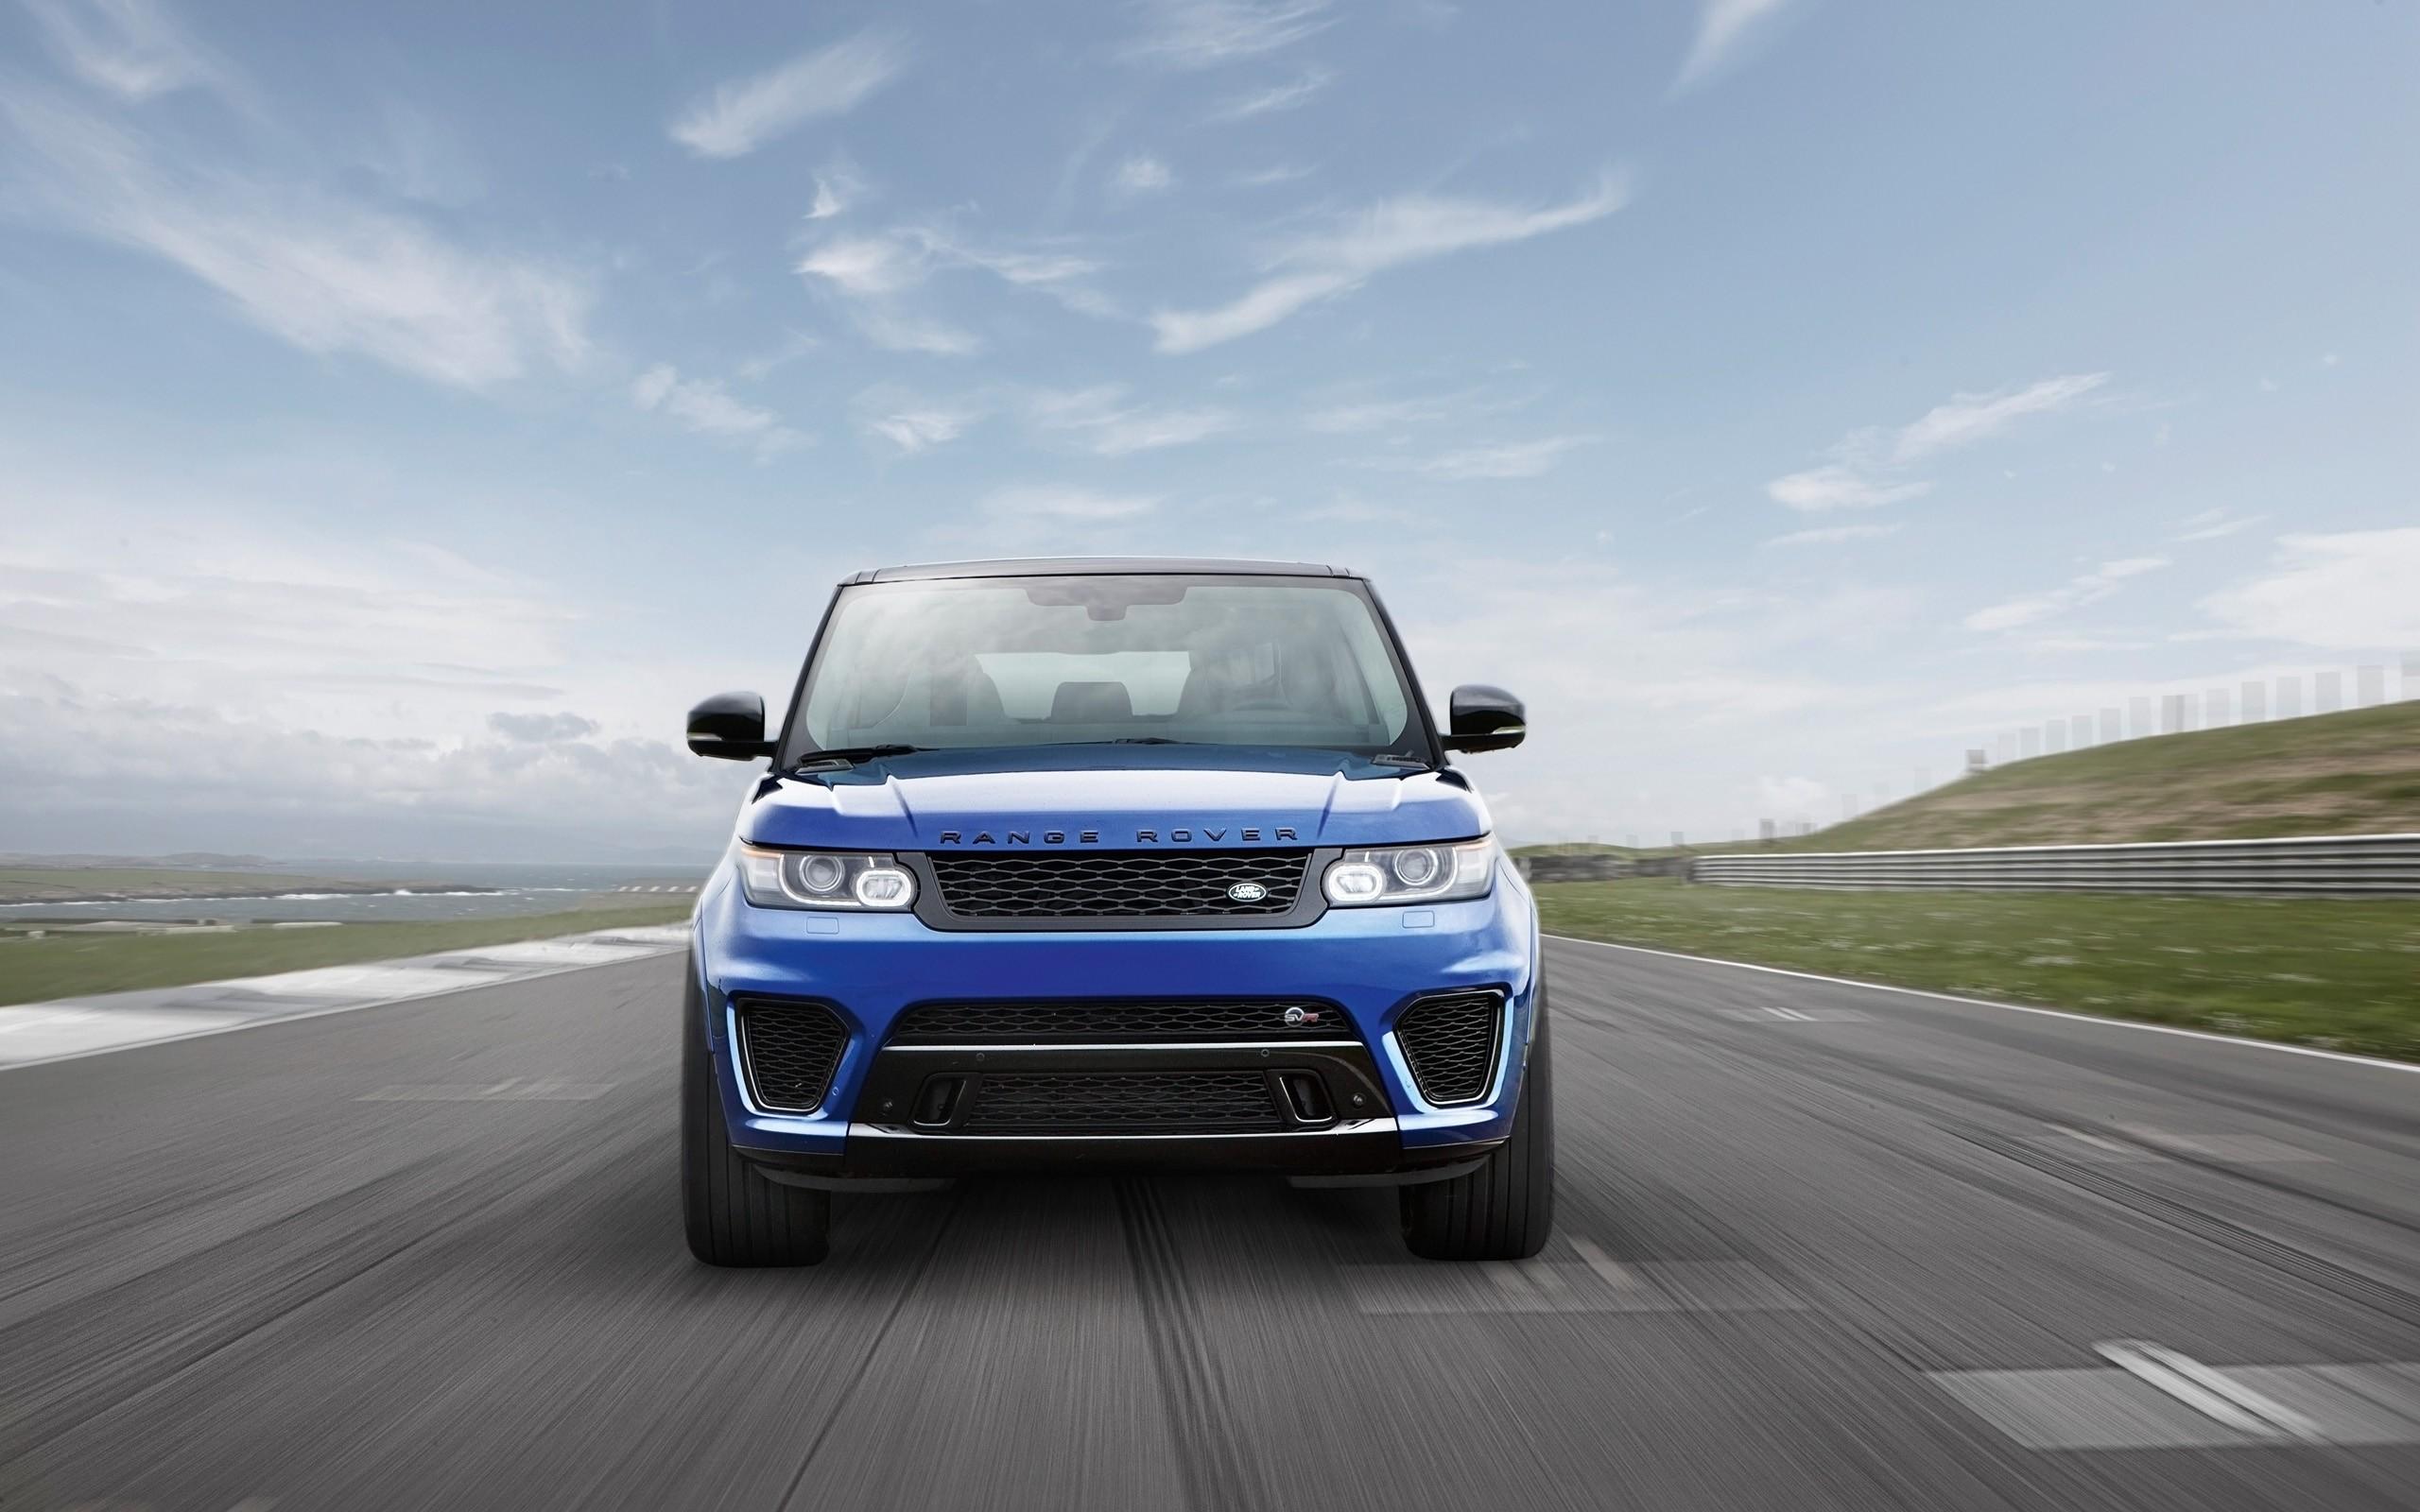 Dynamic Iphone X Wallpaper 2015 Land Rover Range Rover Sport Svr 4 Wallpaper Hd Car